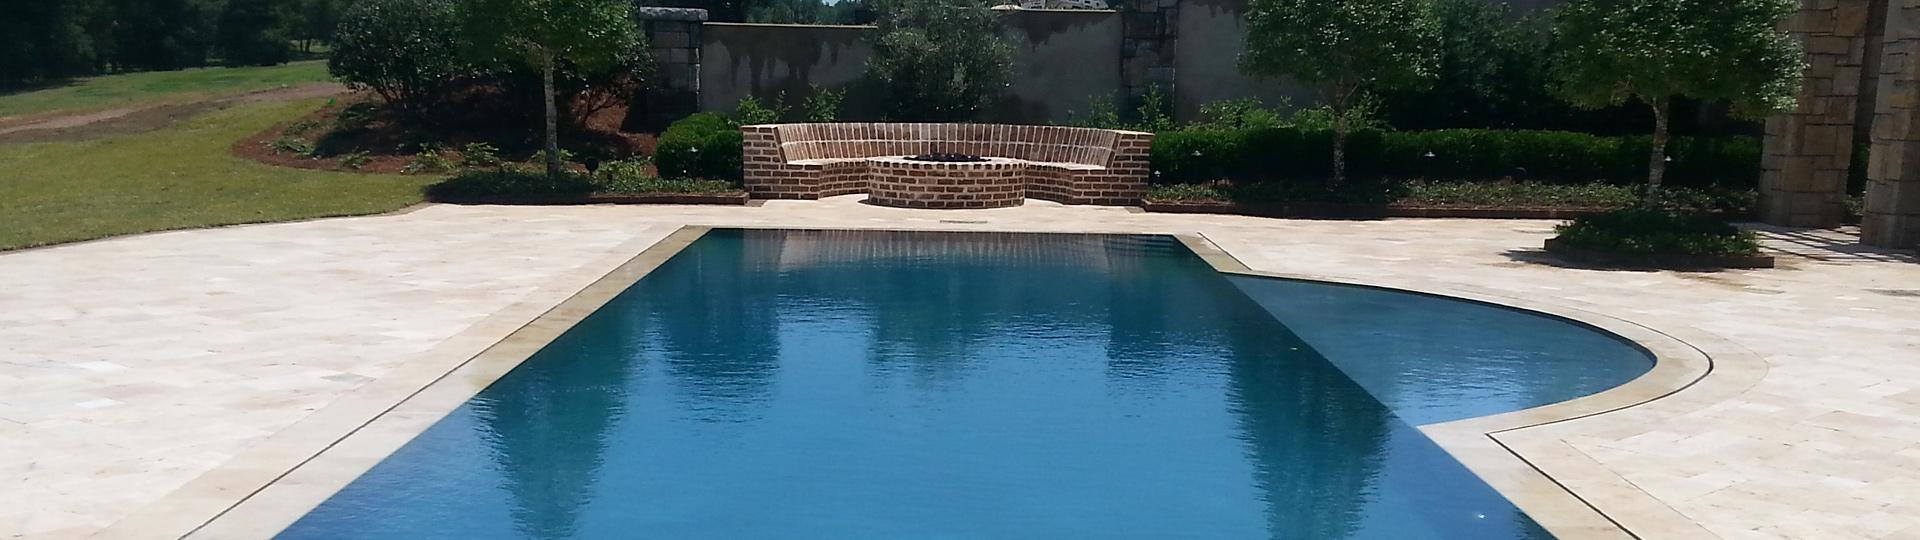 pool design construction repair and maintenance mobile alabama